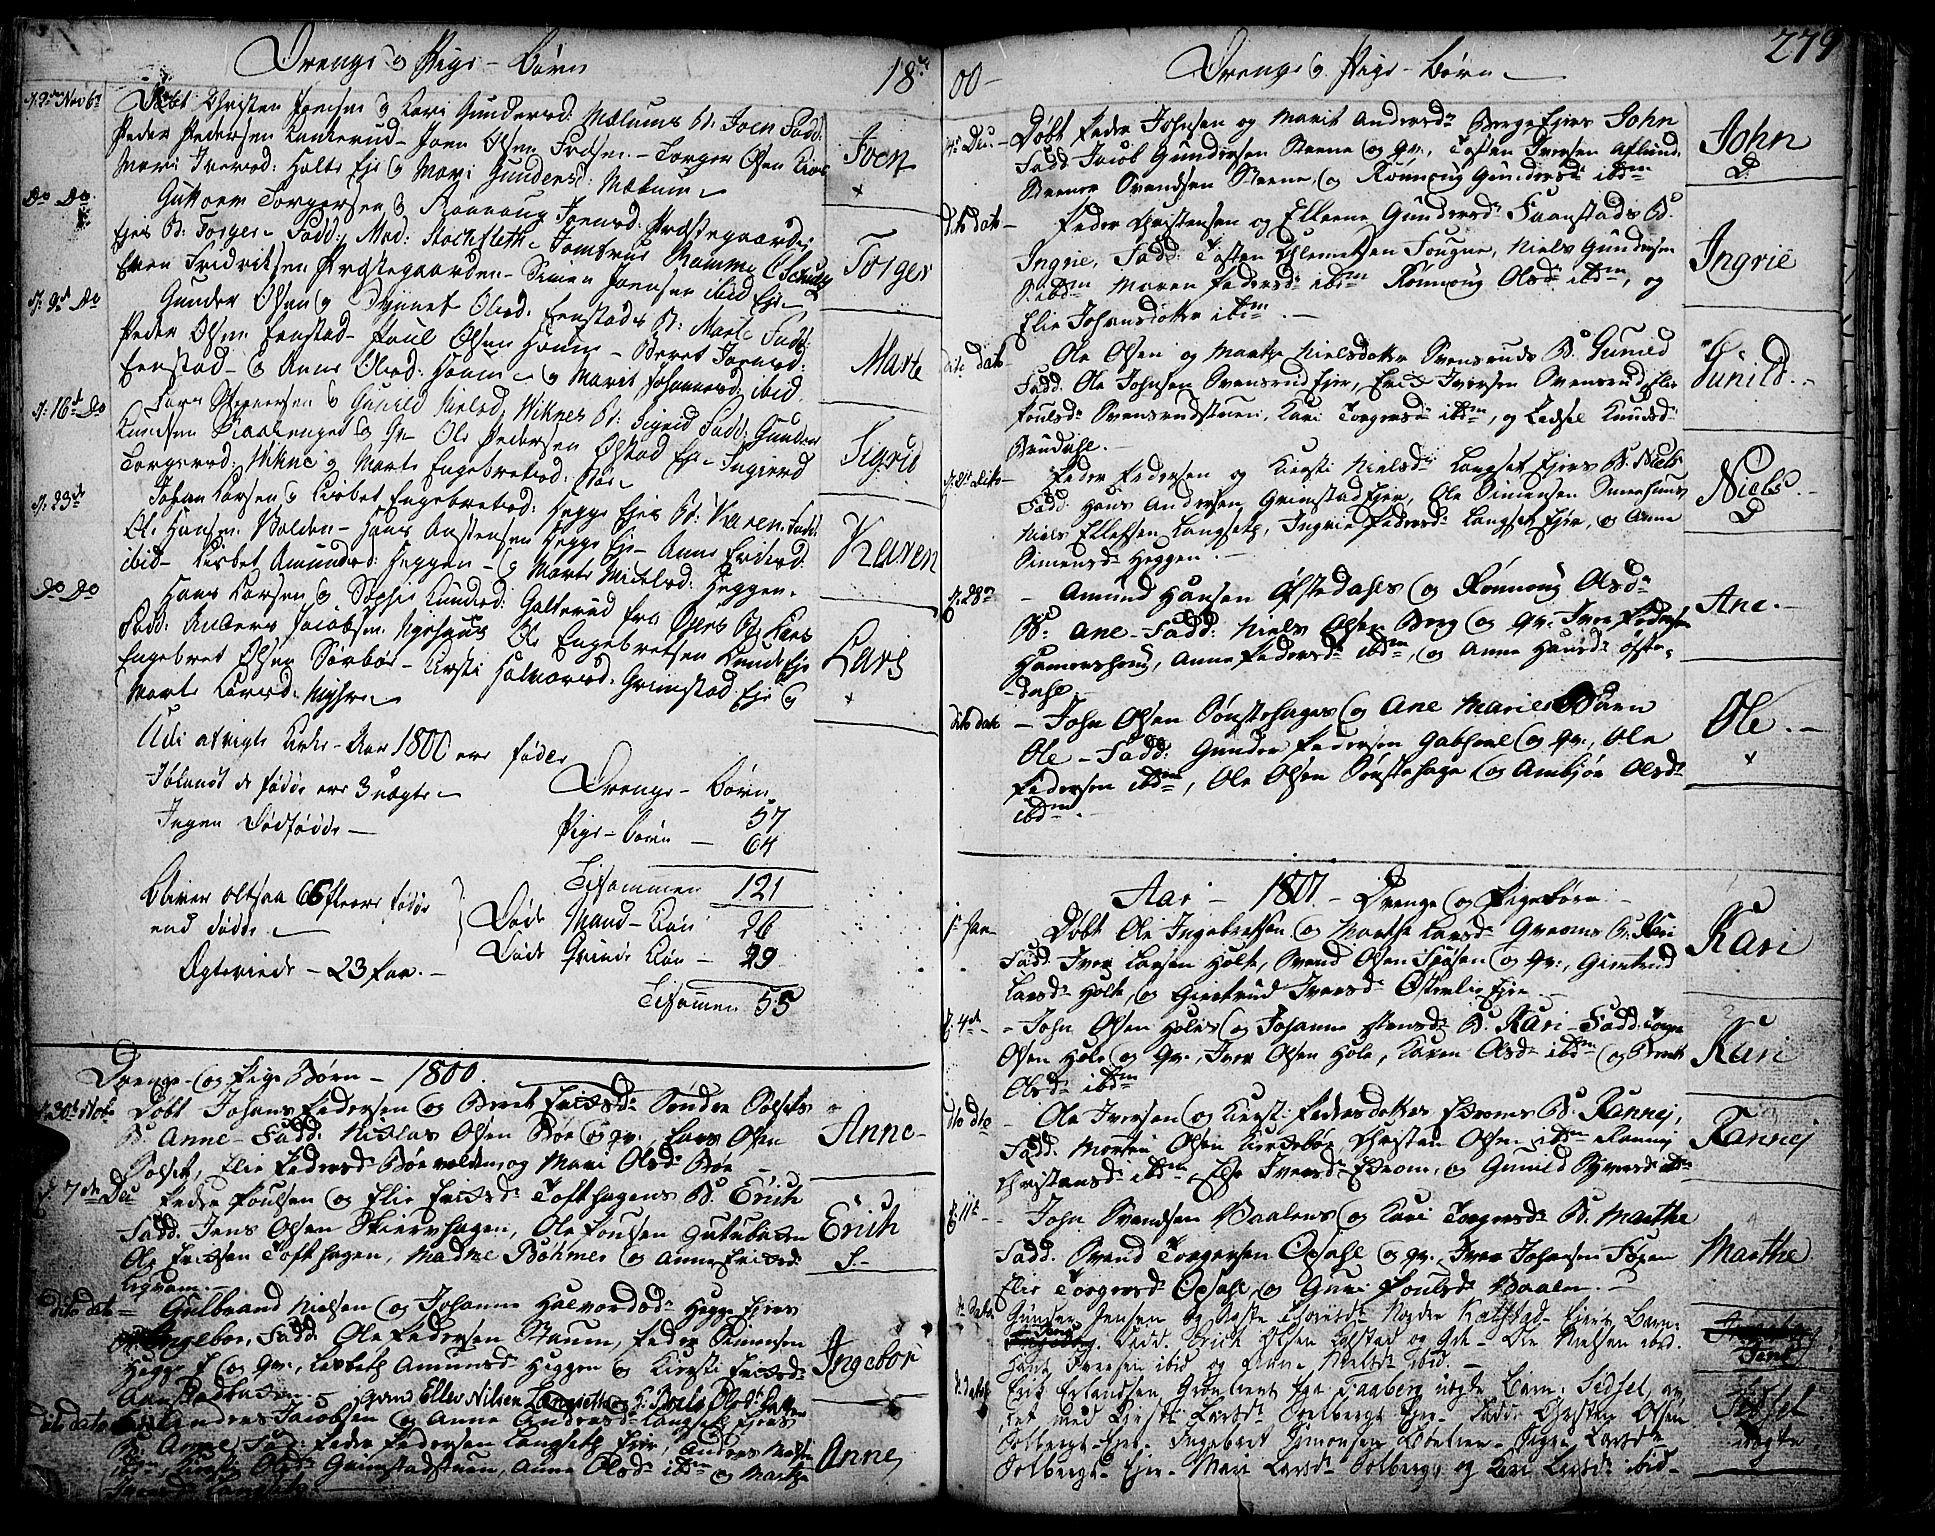 SAH, Gausdal prestekontor, Ministerialbok nr. 3, 1758-1809, s. 279